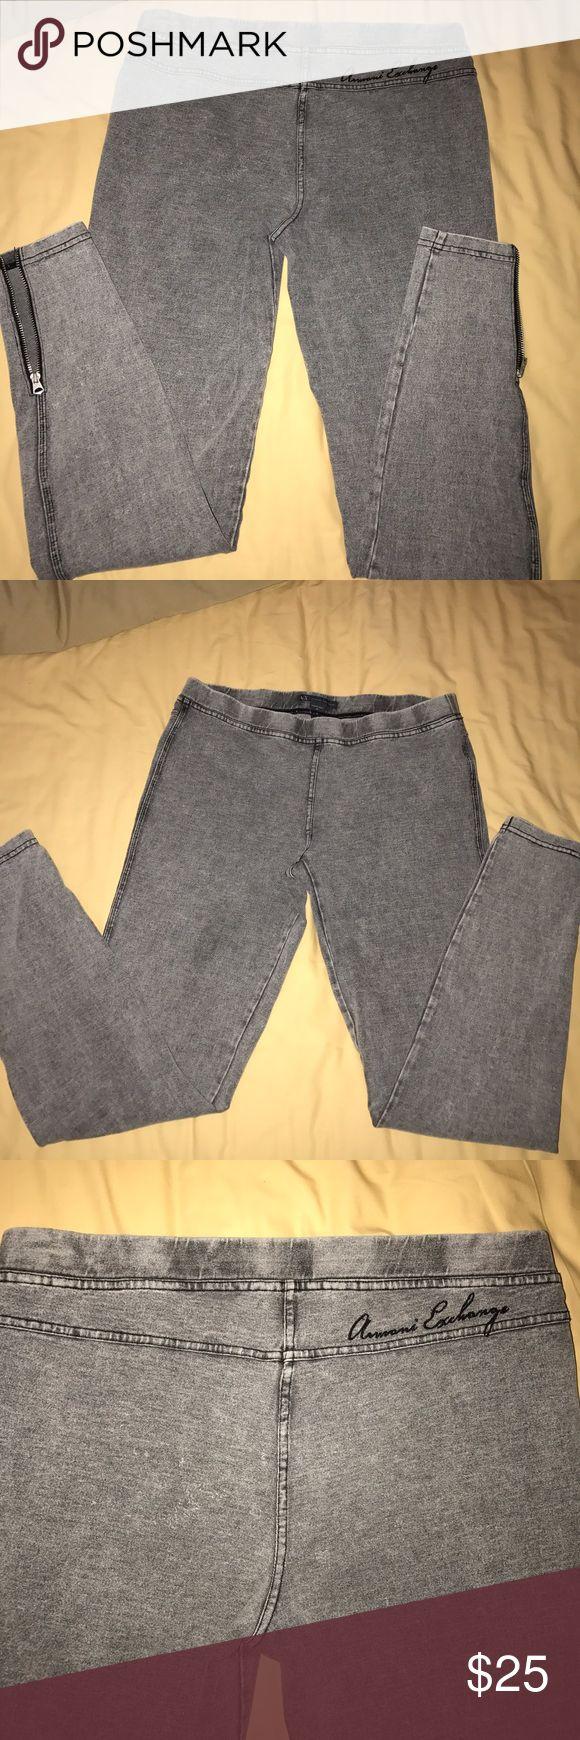 Armani Exchange zip leggings Gently worn Armani Exchange zipper leg leggings. A/X Armani Exchange Pants Leggings